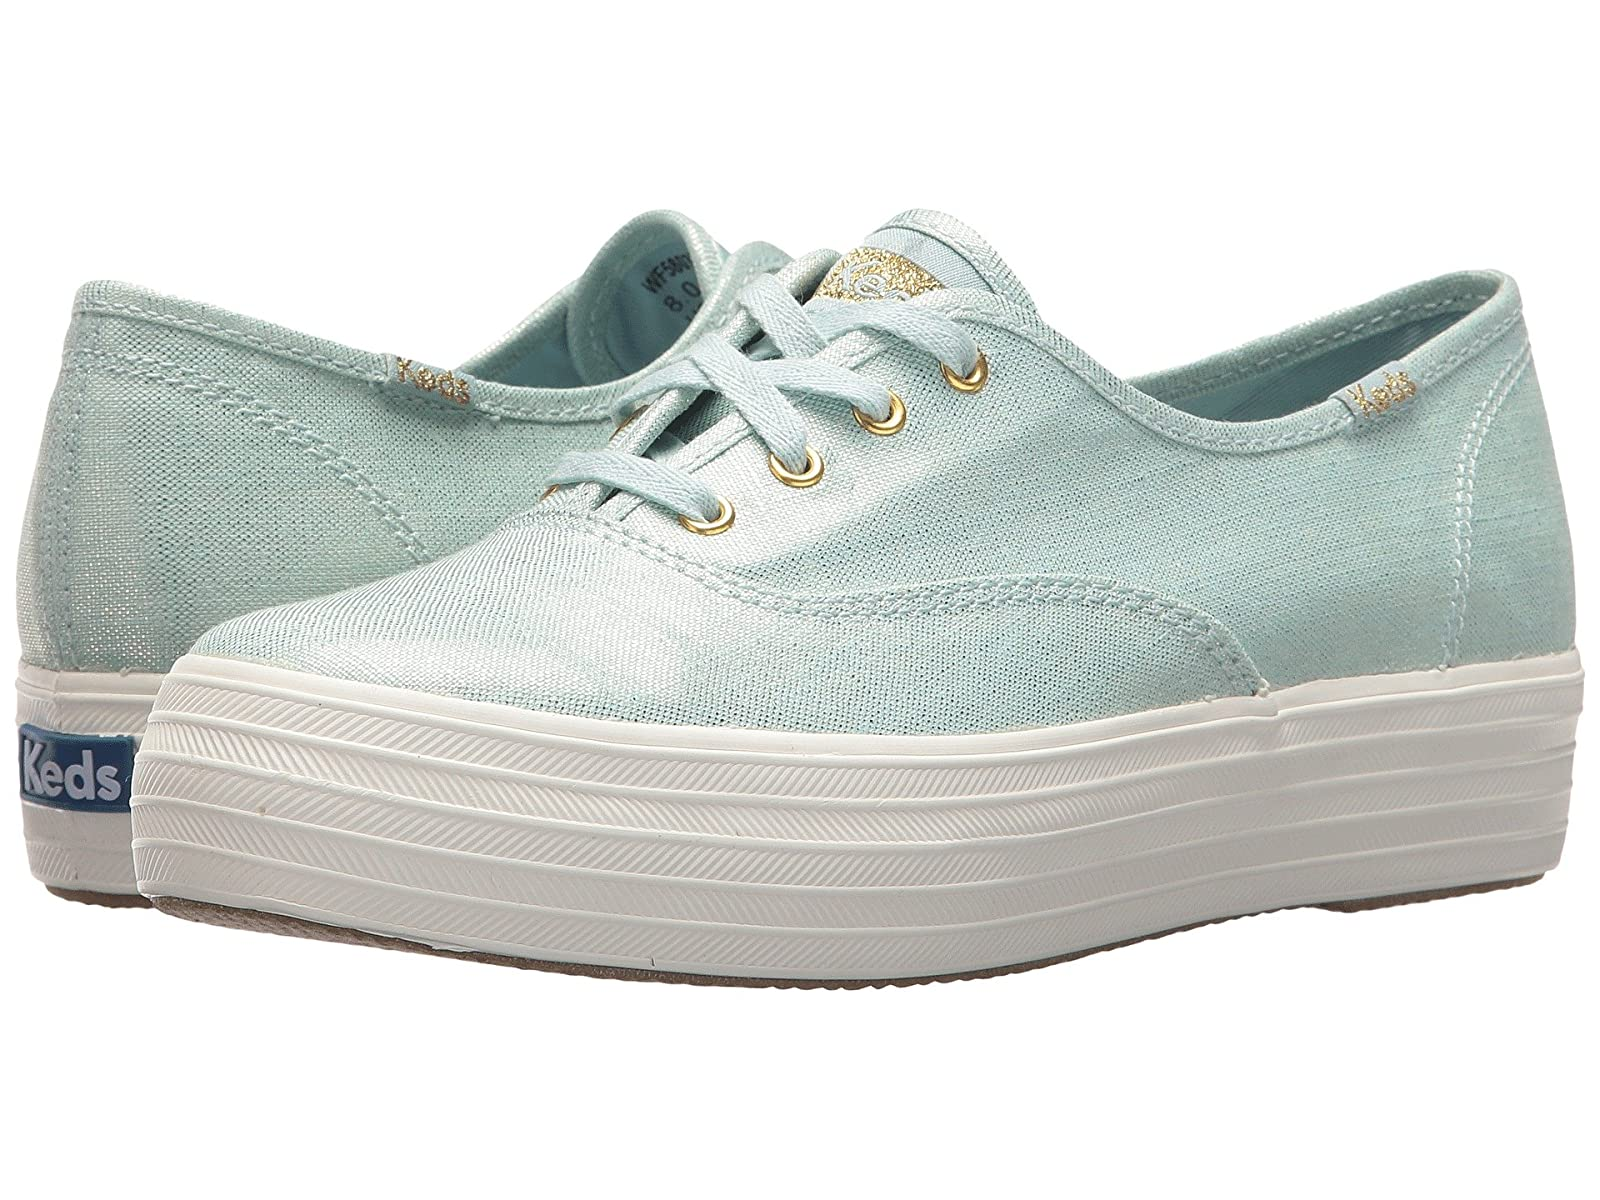 Keds Triple Metallic LinenCheap and distinctive eye-catching shoes